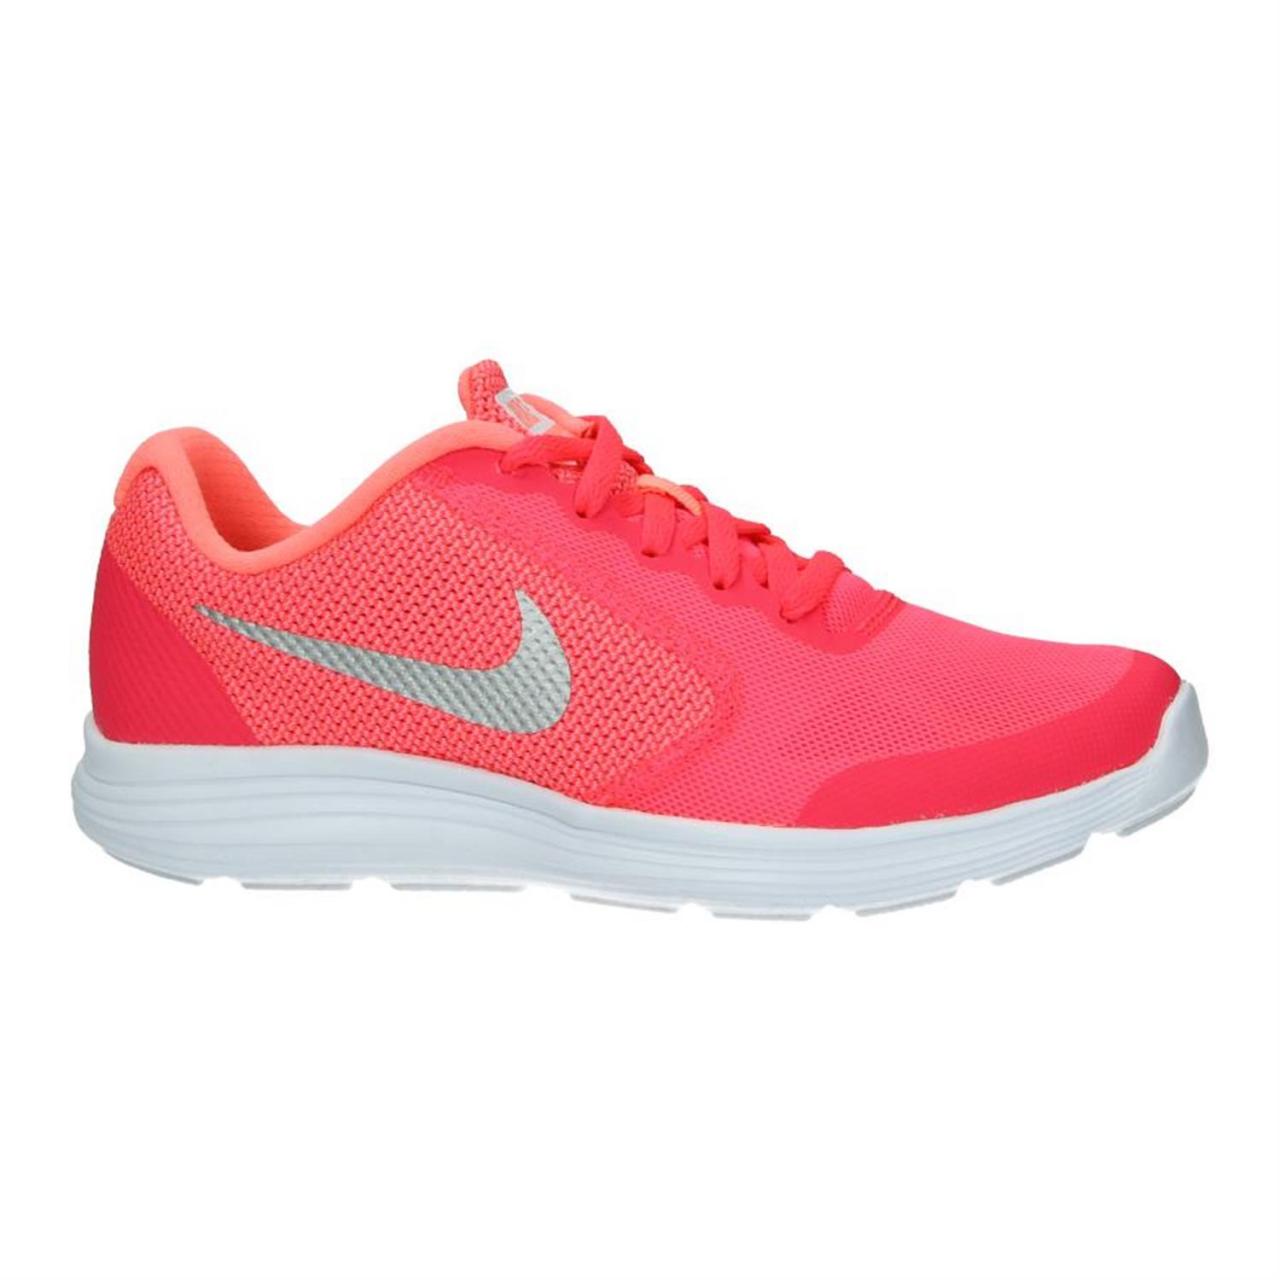 d9b1dbf6f24518 Compare. Nike Revolution 3 Junior Running Shoe